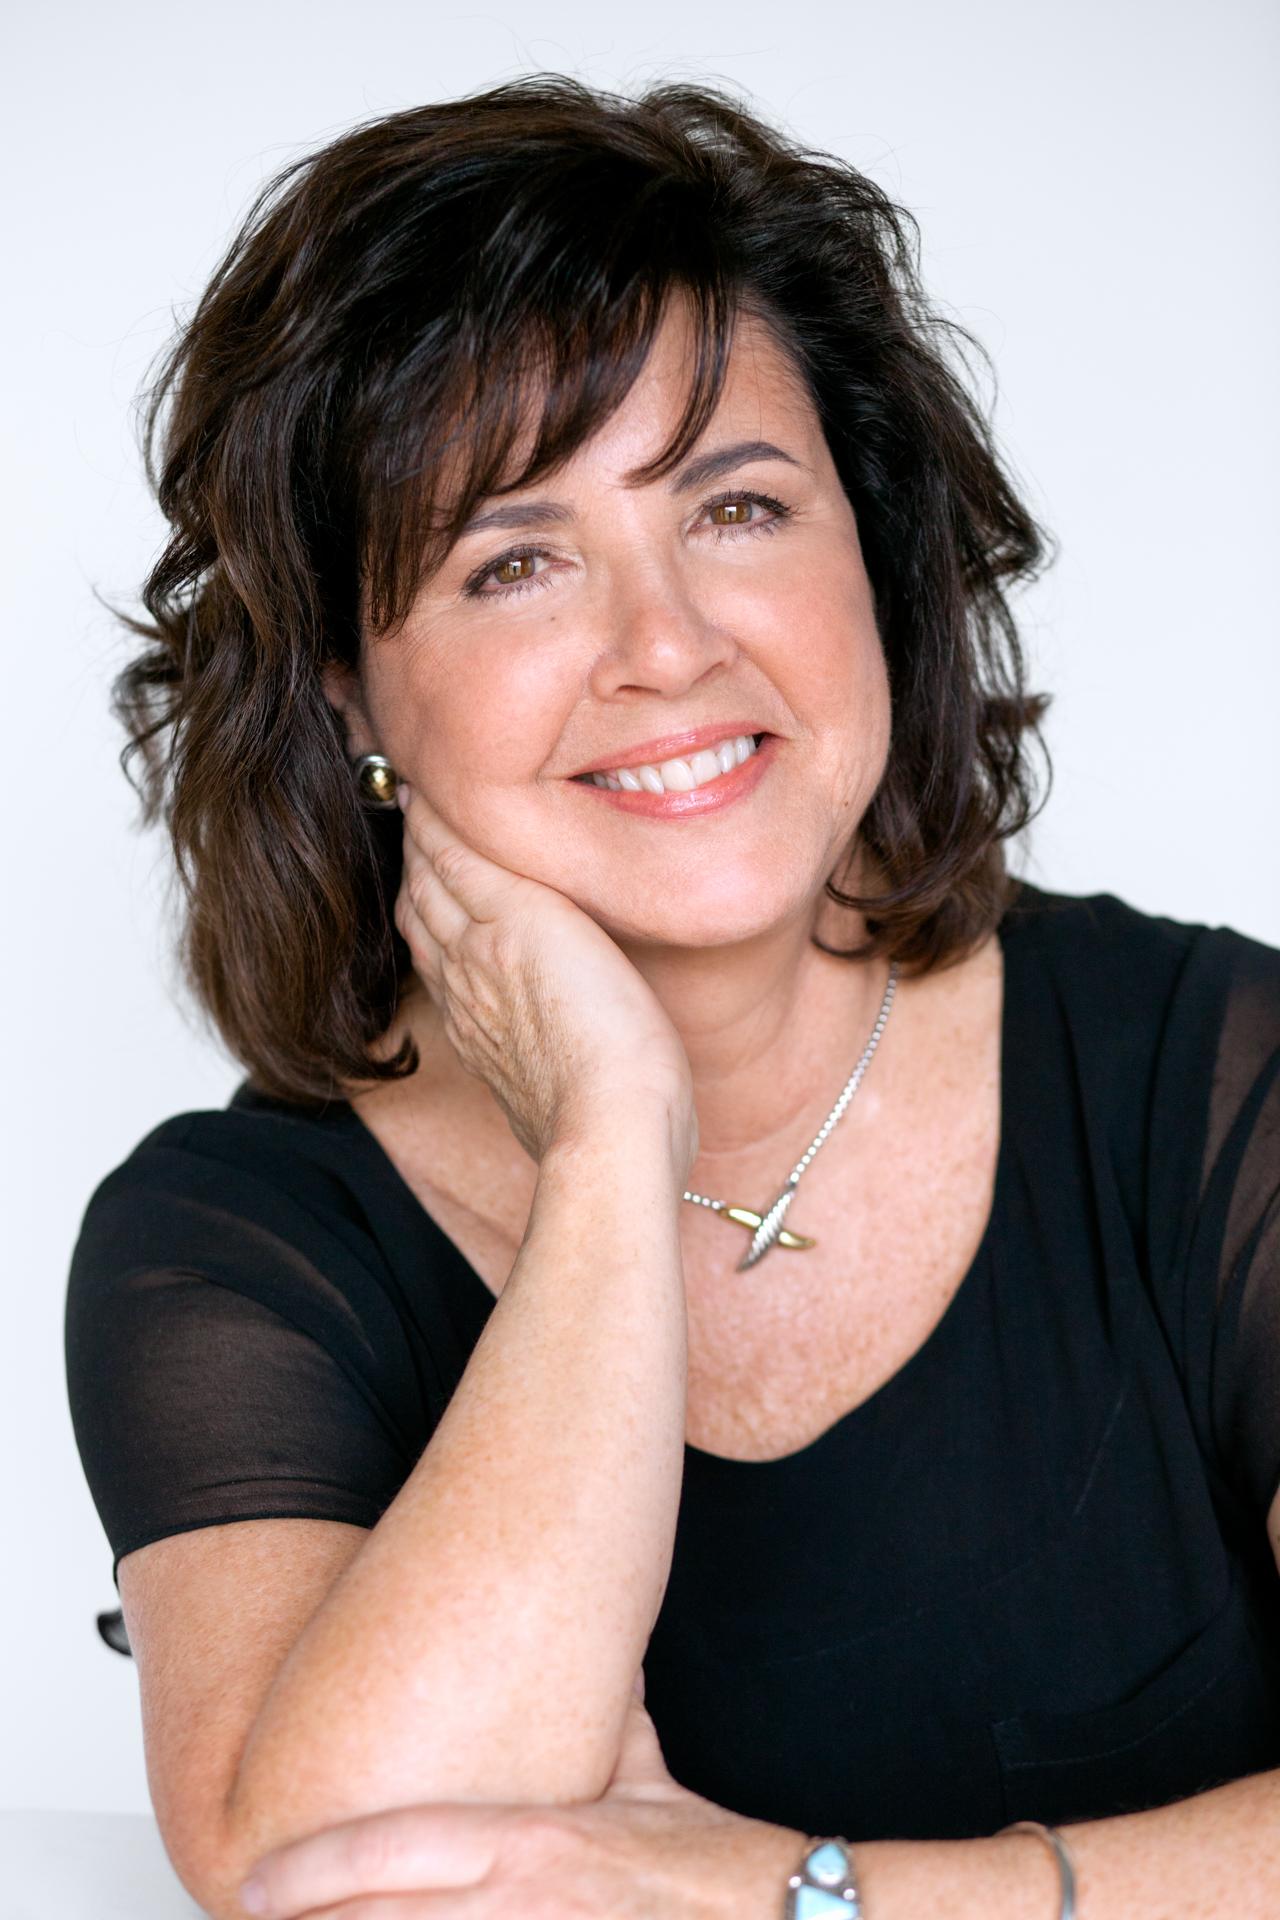 Debbie Fitzpatrick - 1.jpg